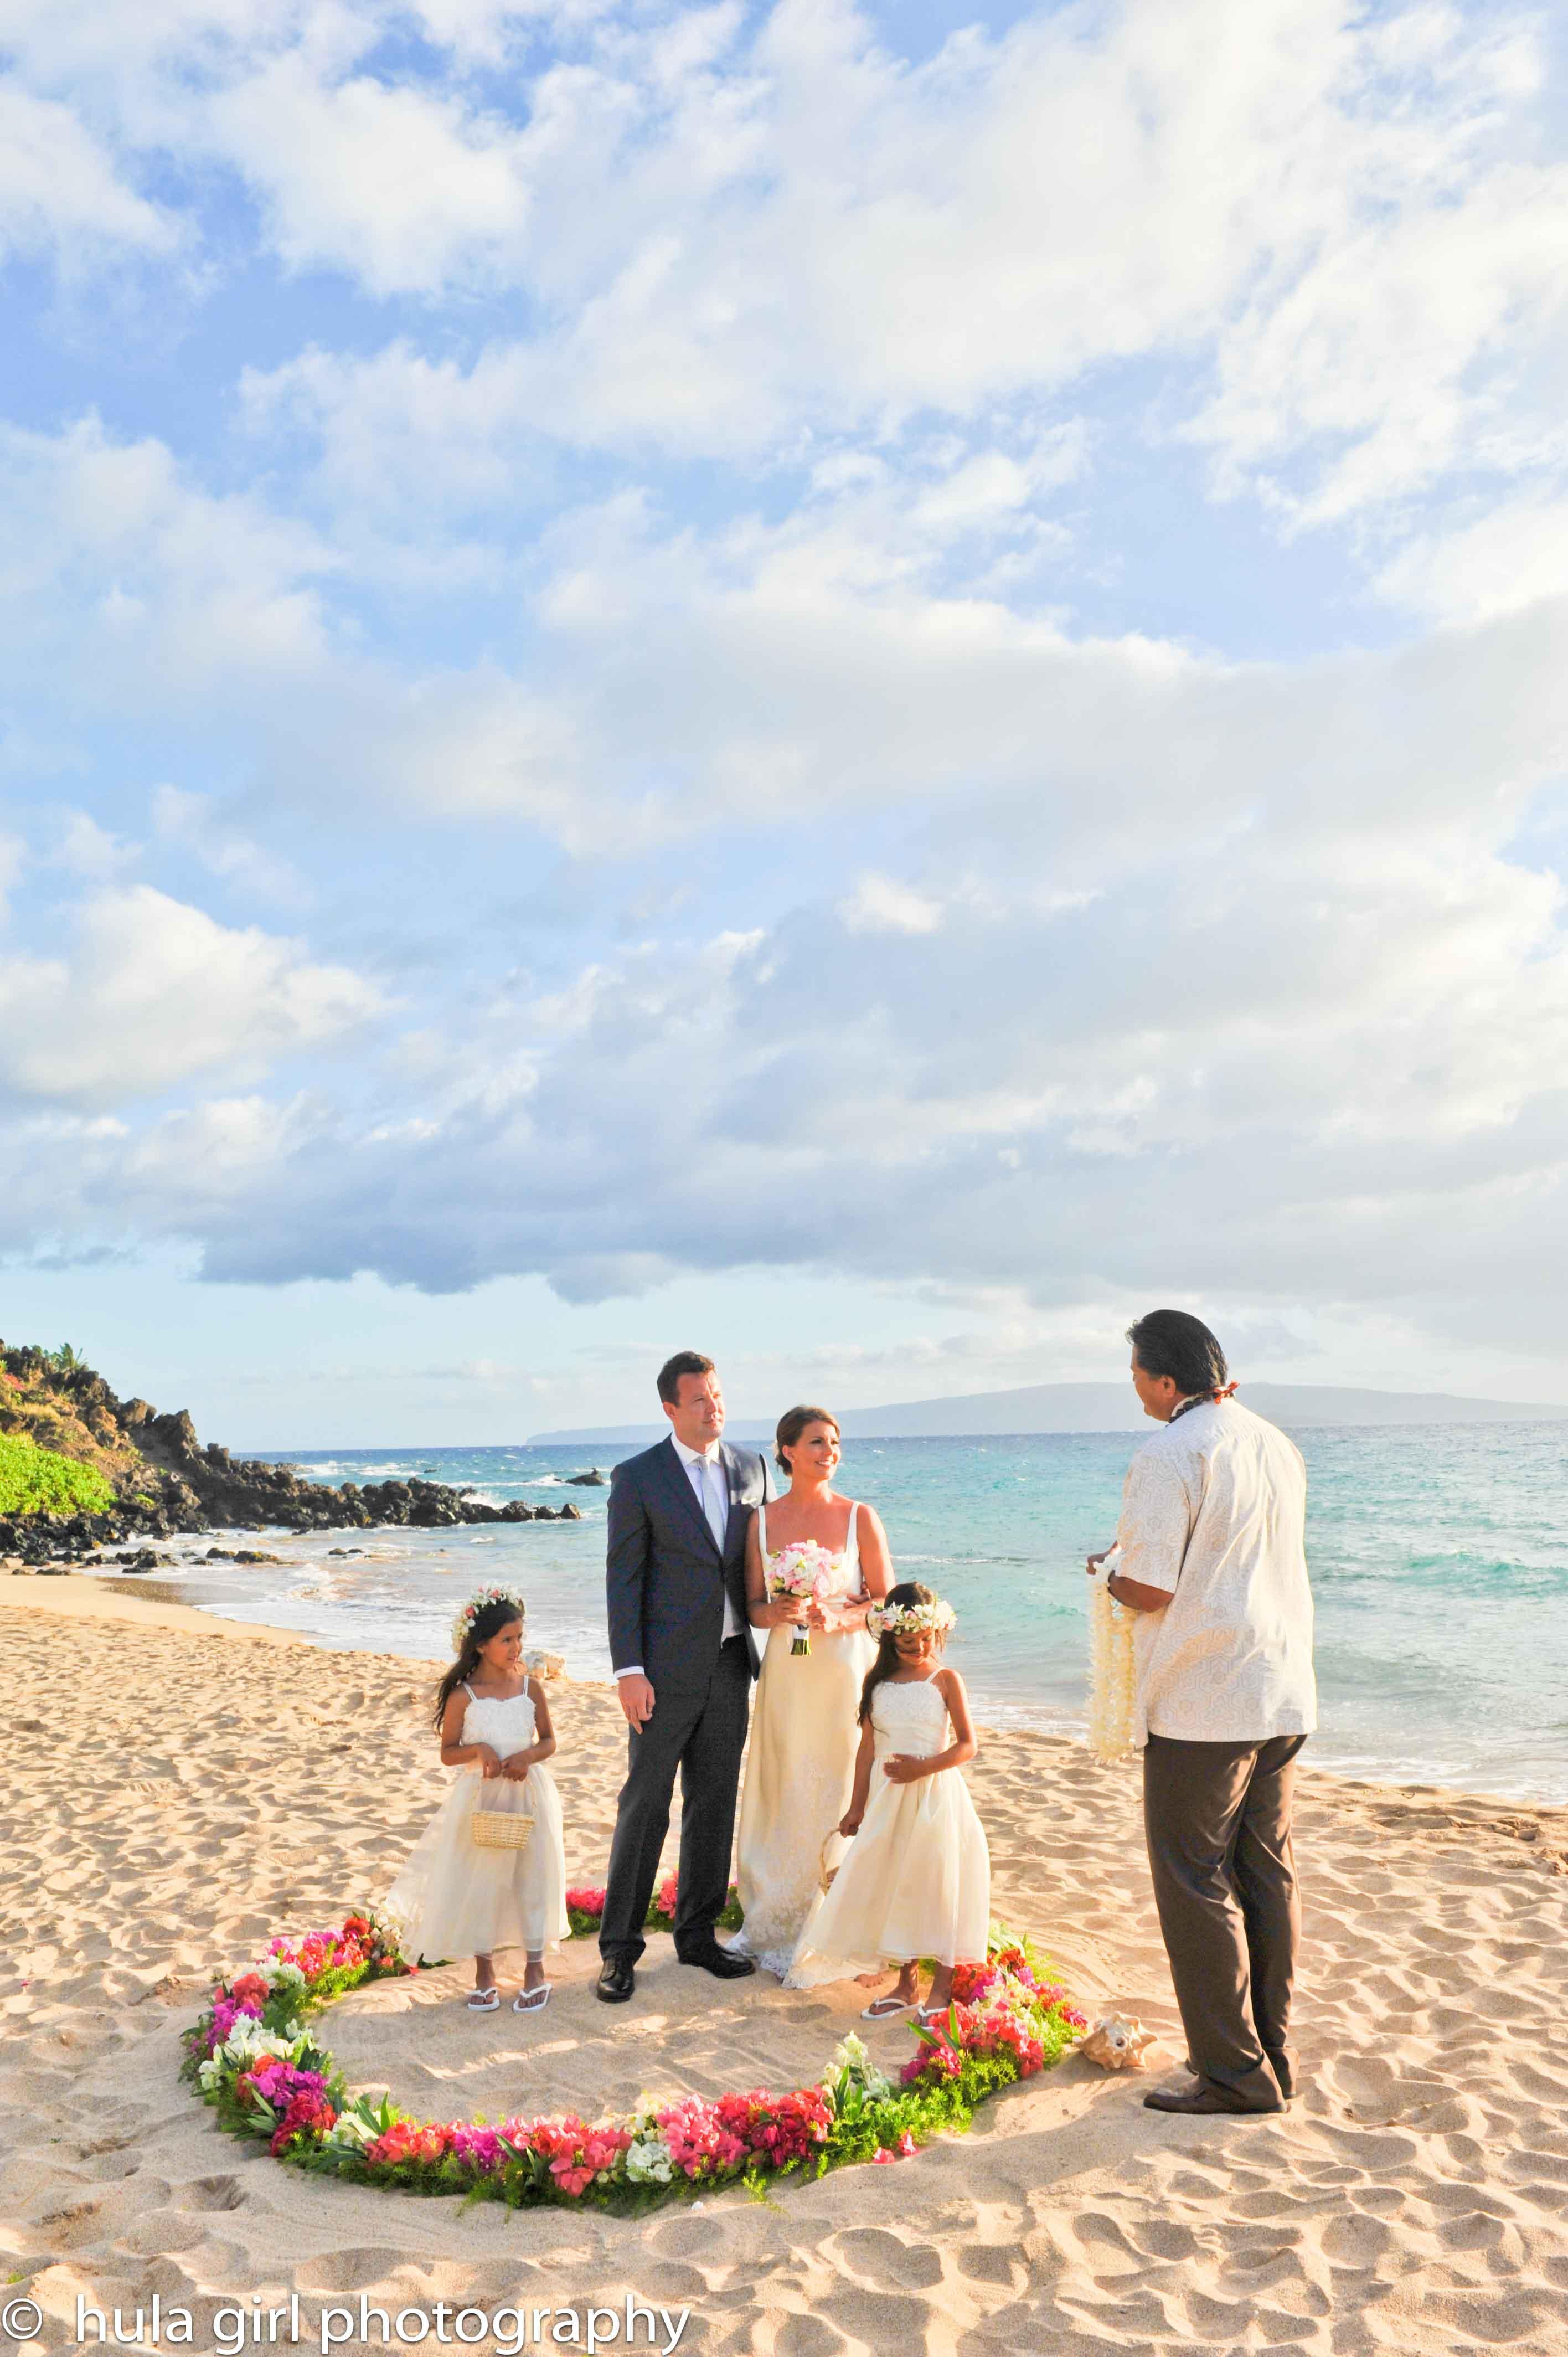 Top 5 South Maui Beaches For Weddings